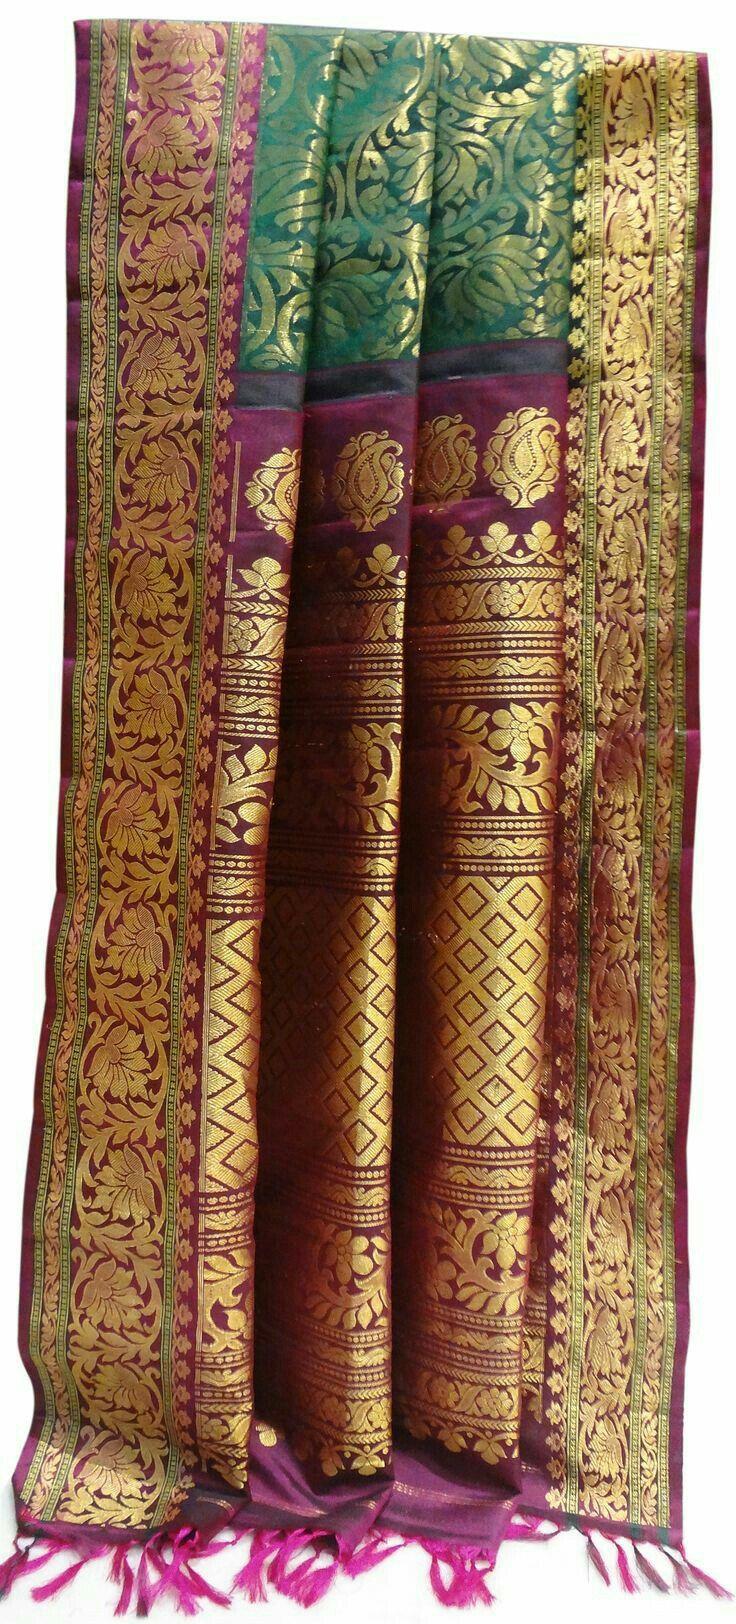 Yeola paithani saree images pin by kyle kallis on latest fashion  pinterest  fashion